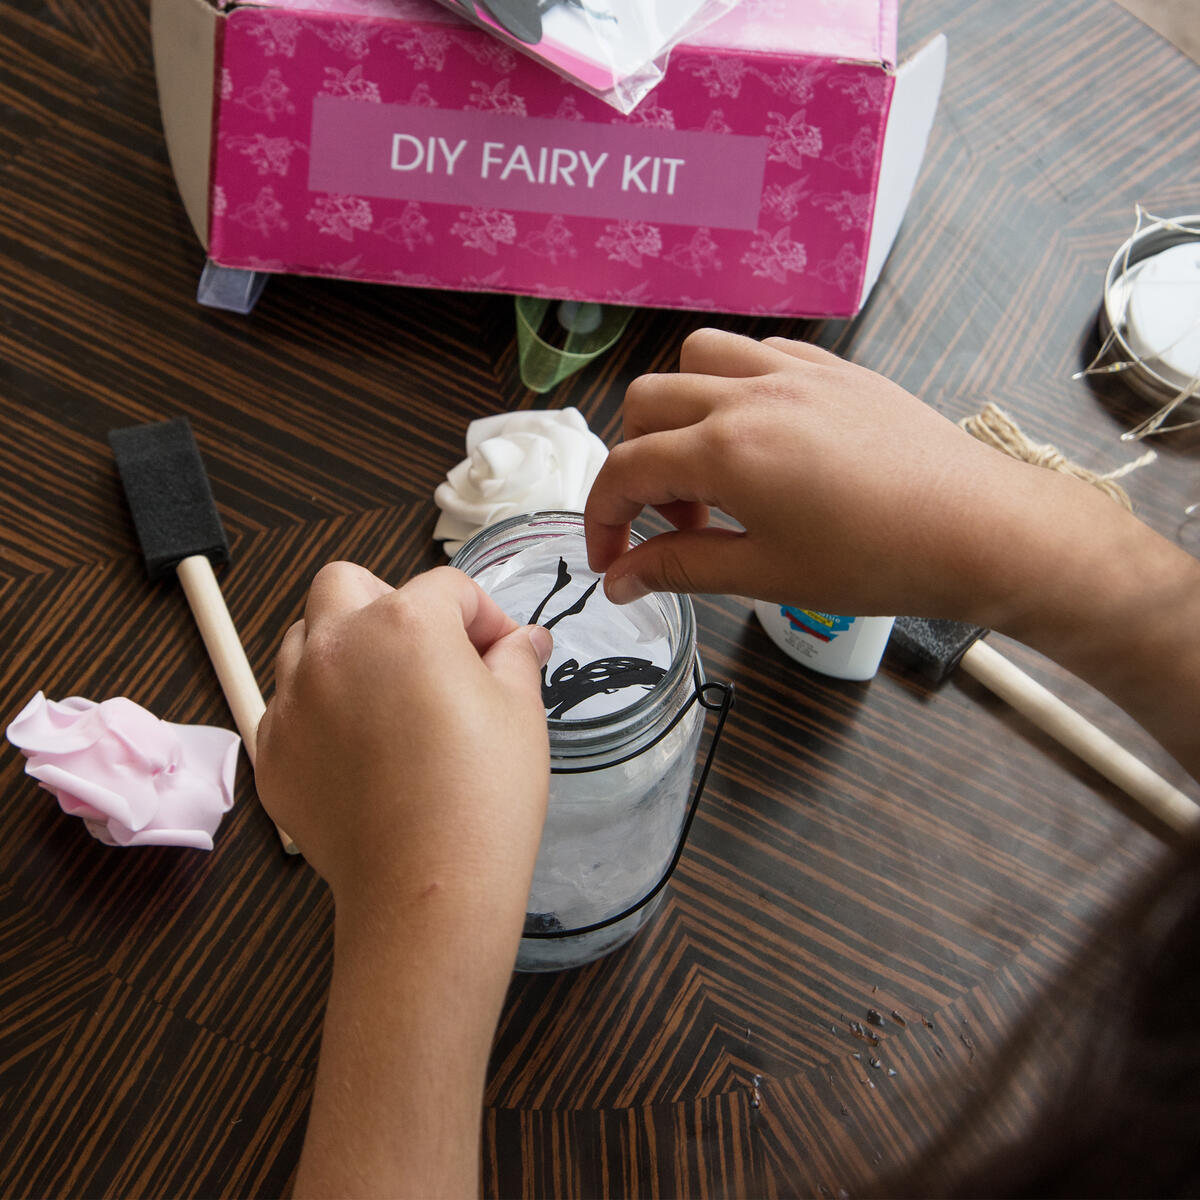 Fairy Lantern Craft Kit DIY [2 Pack] Fairy Night Lights - Art Crafts